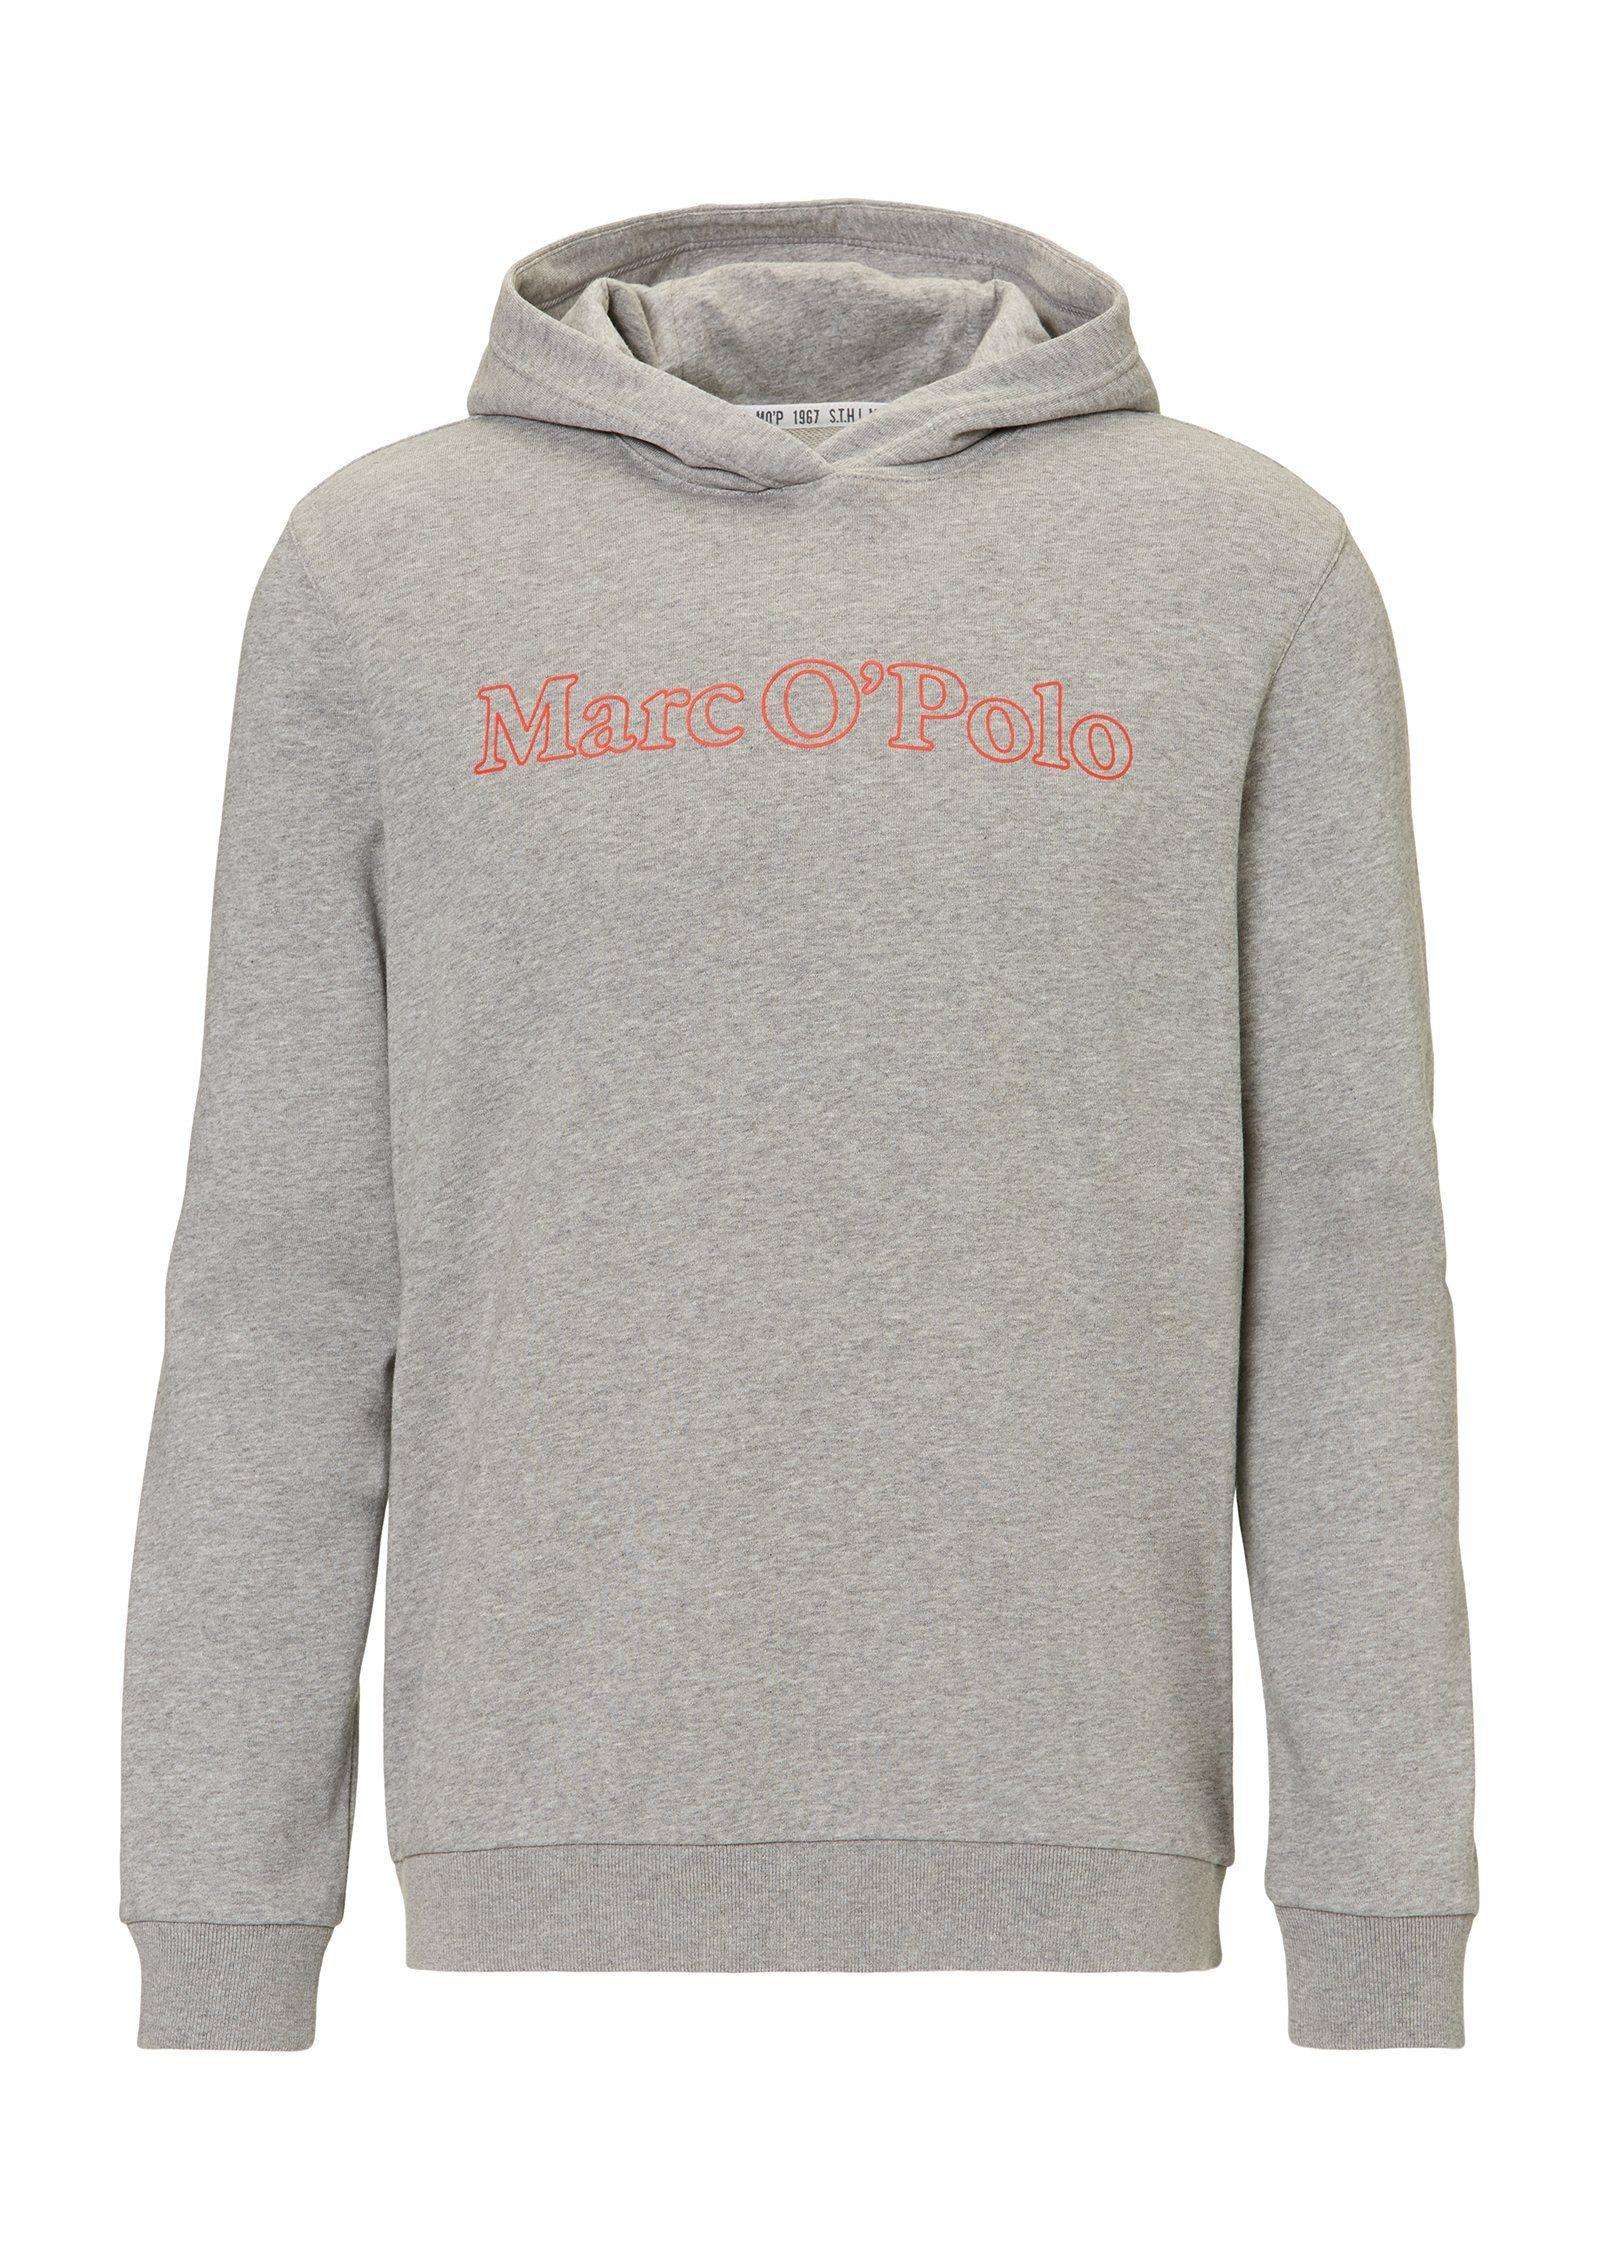 Marc O'Polo Sweatshirt online kaufen   OTTO